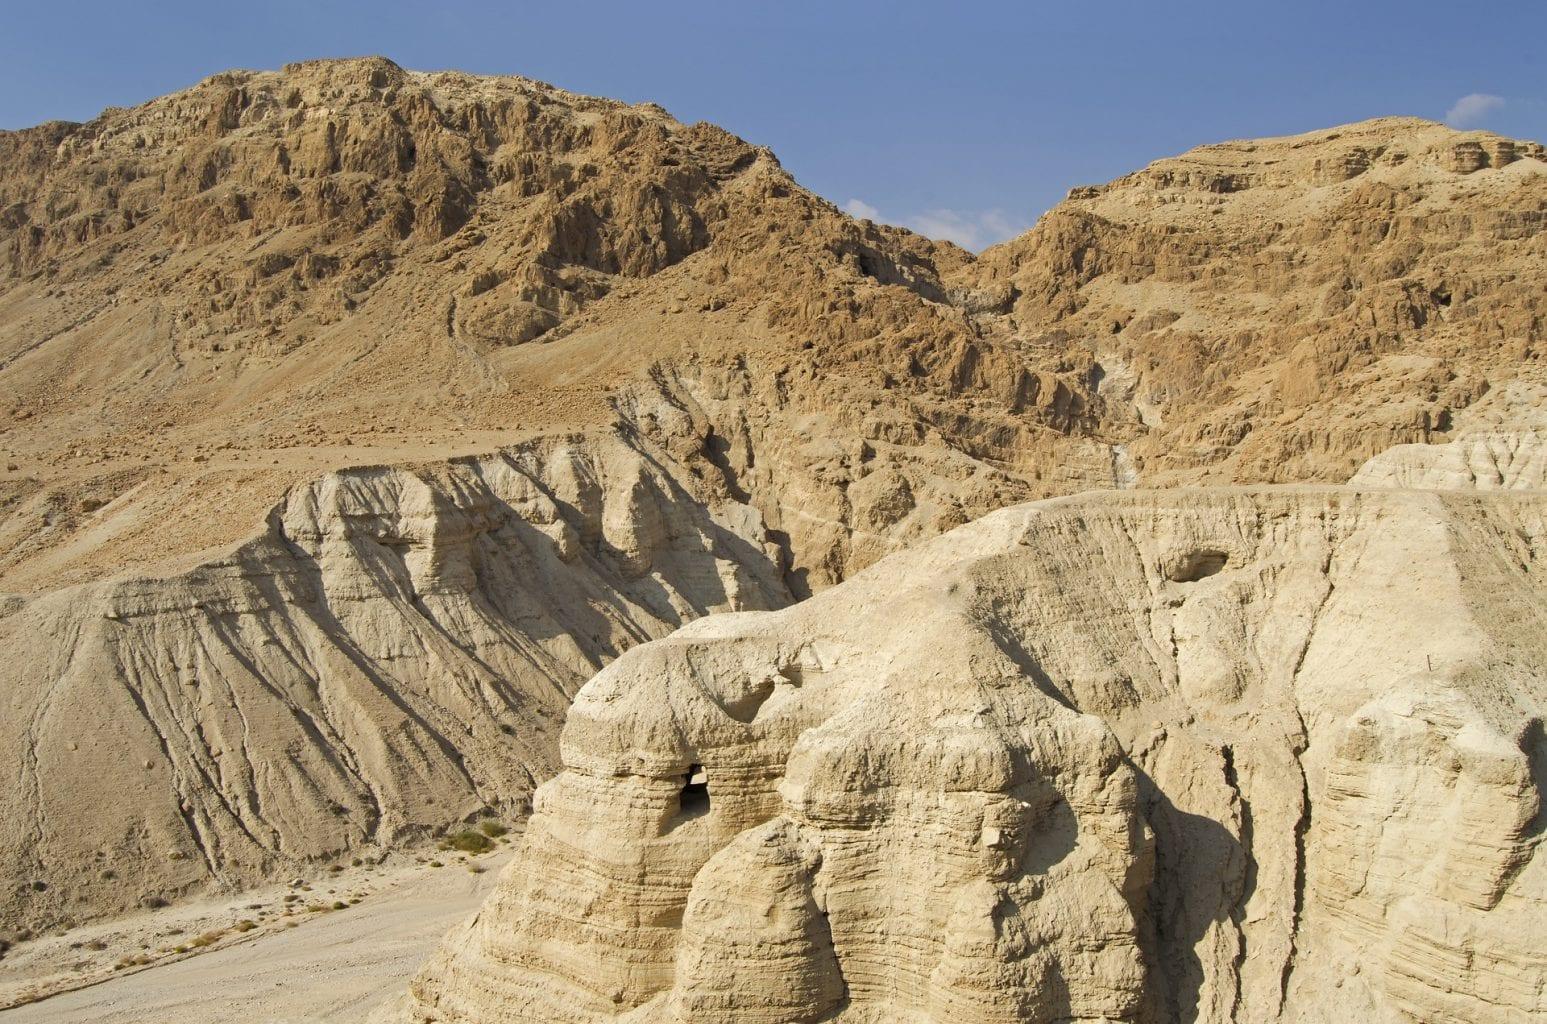 The Qumran Caves. Credit: Pixabay